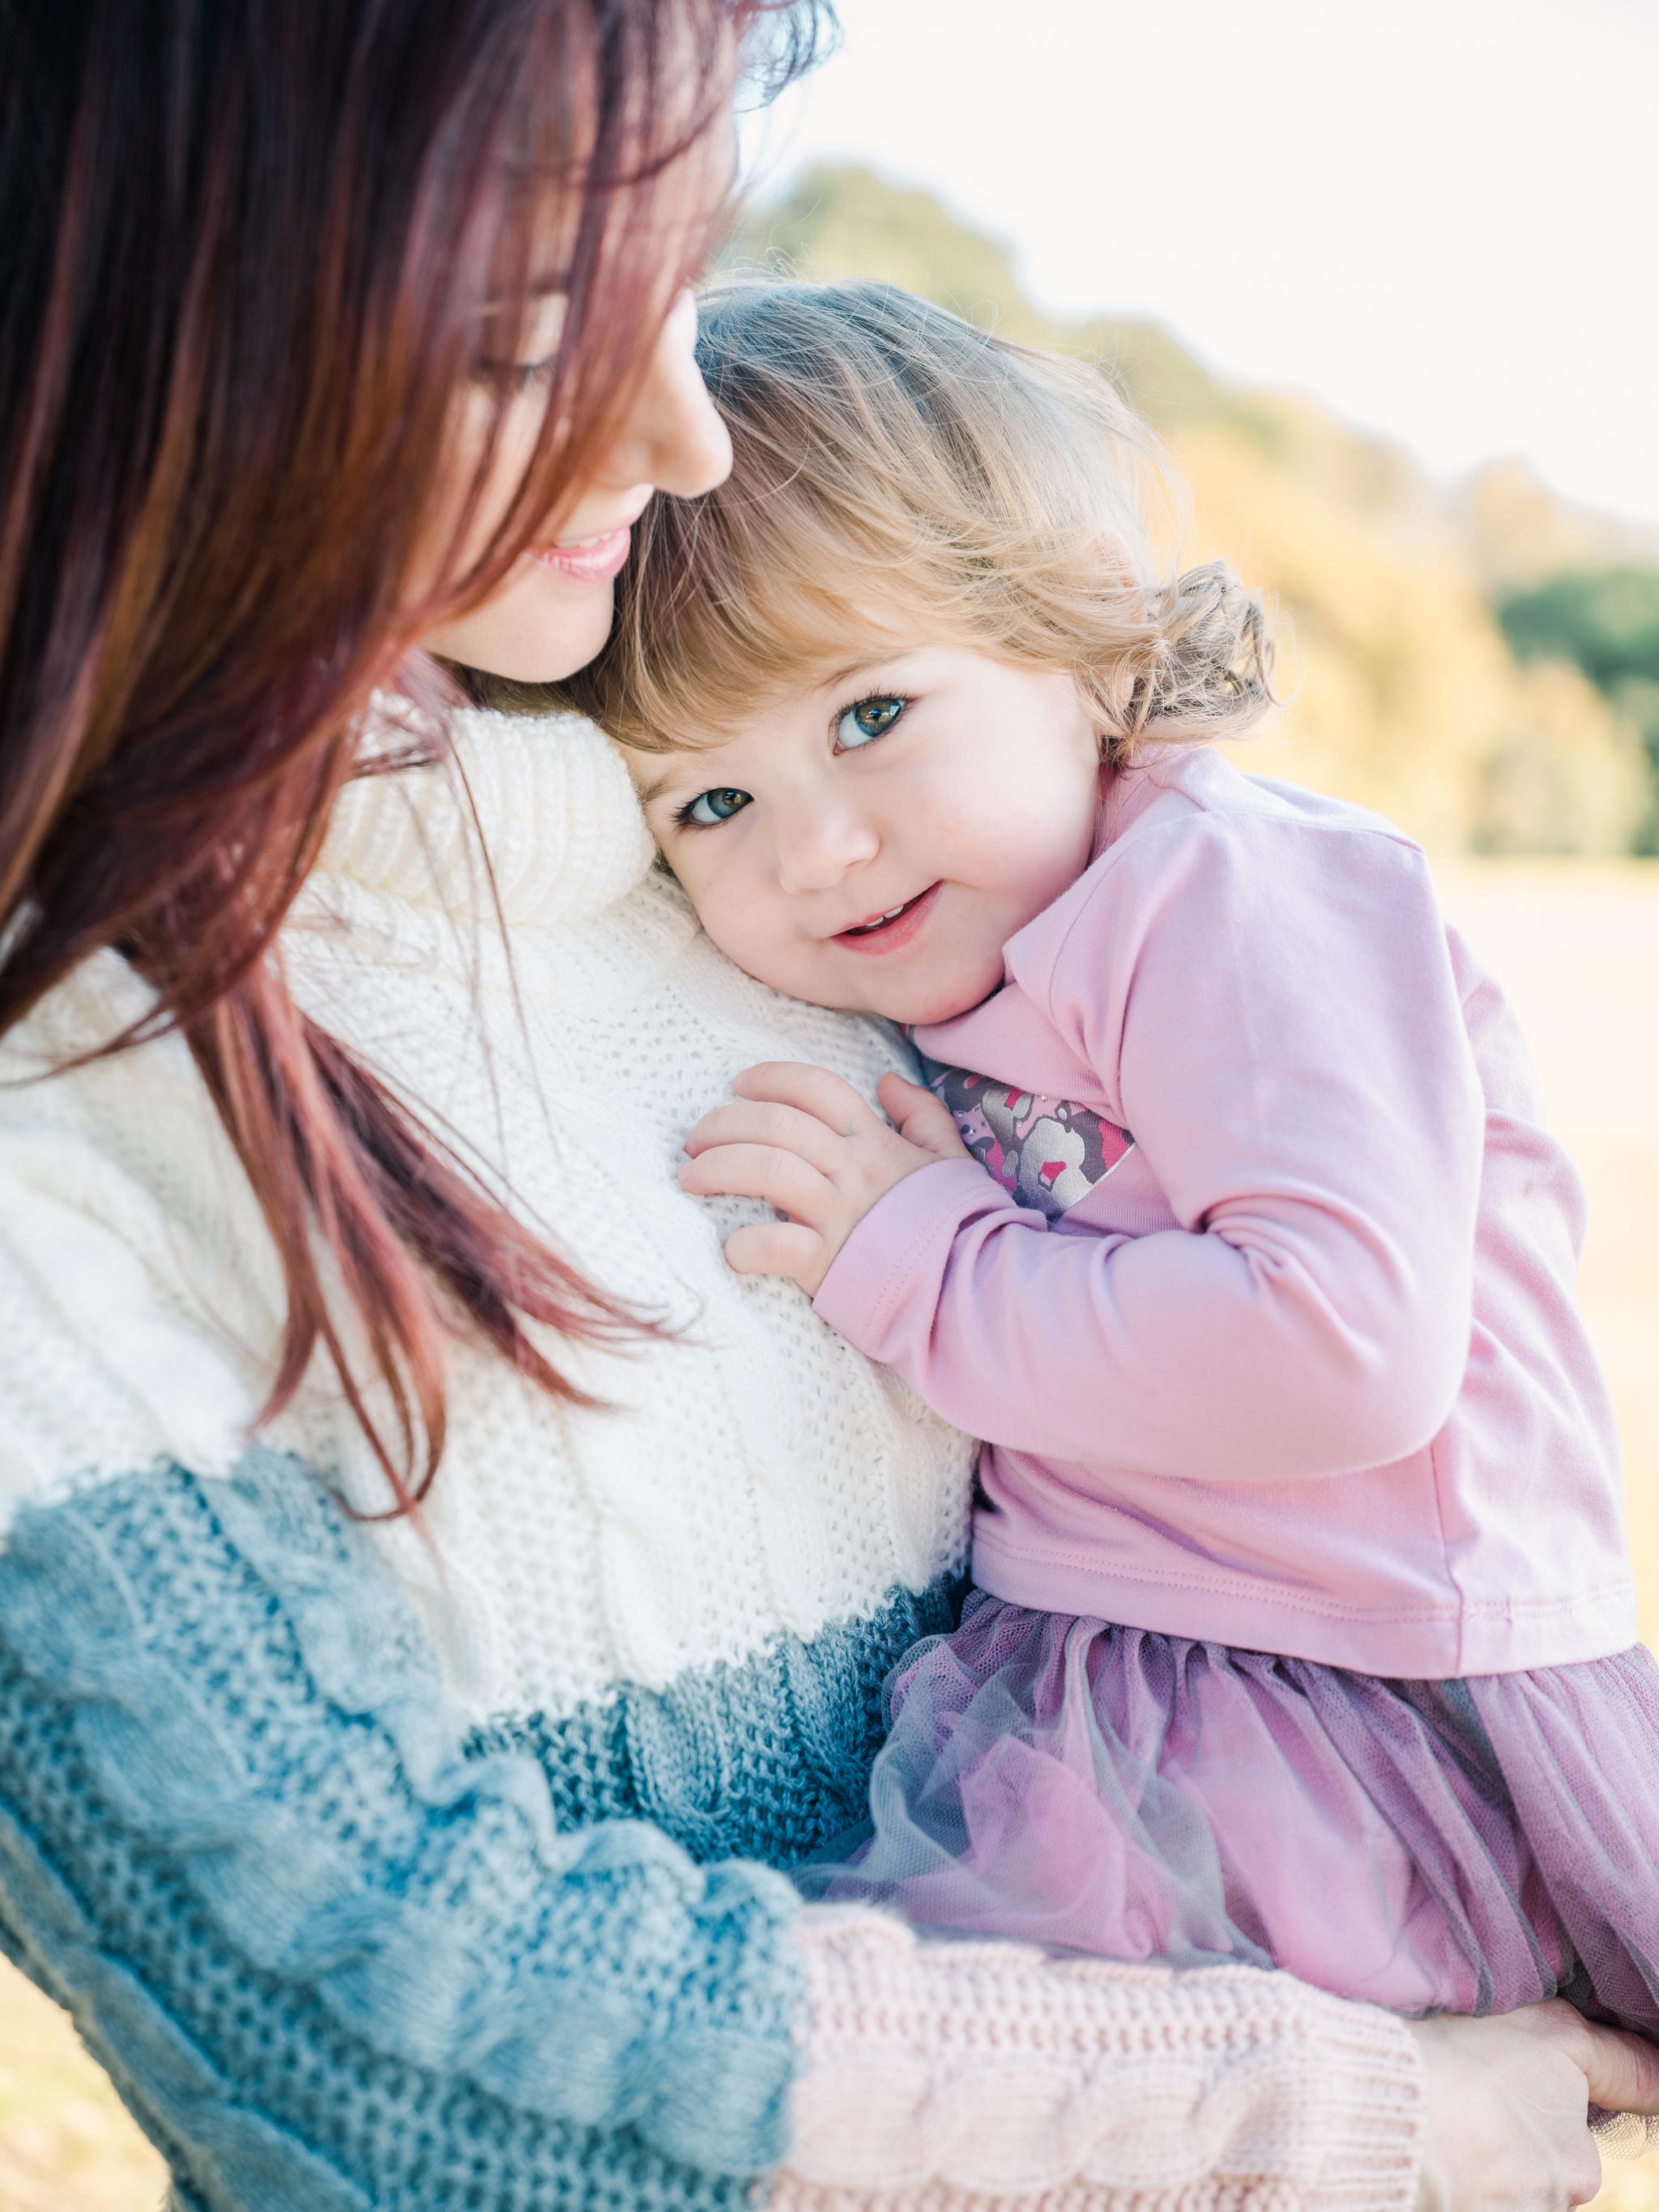 fotografia-infantil-familiar05.jpg